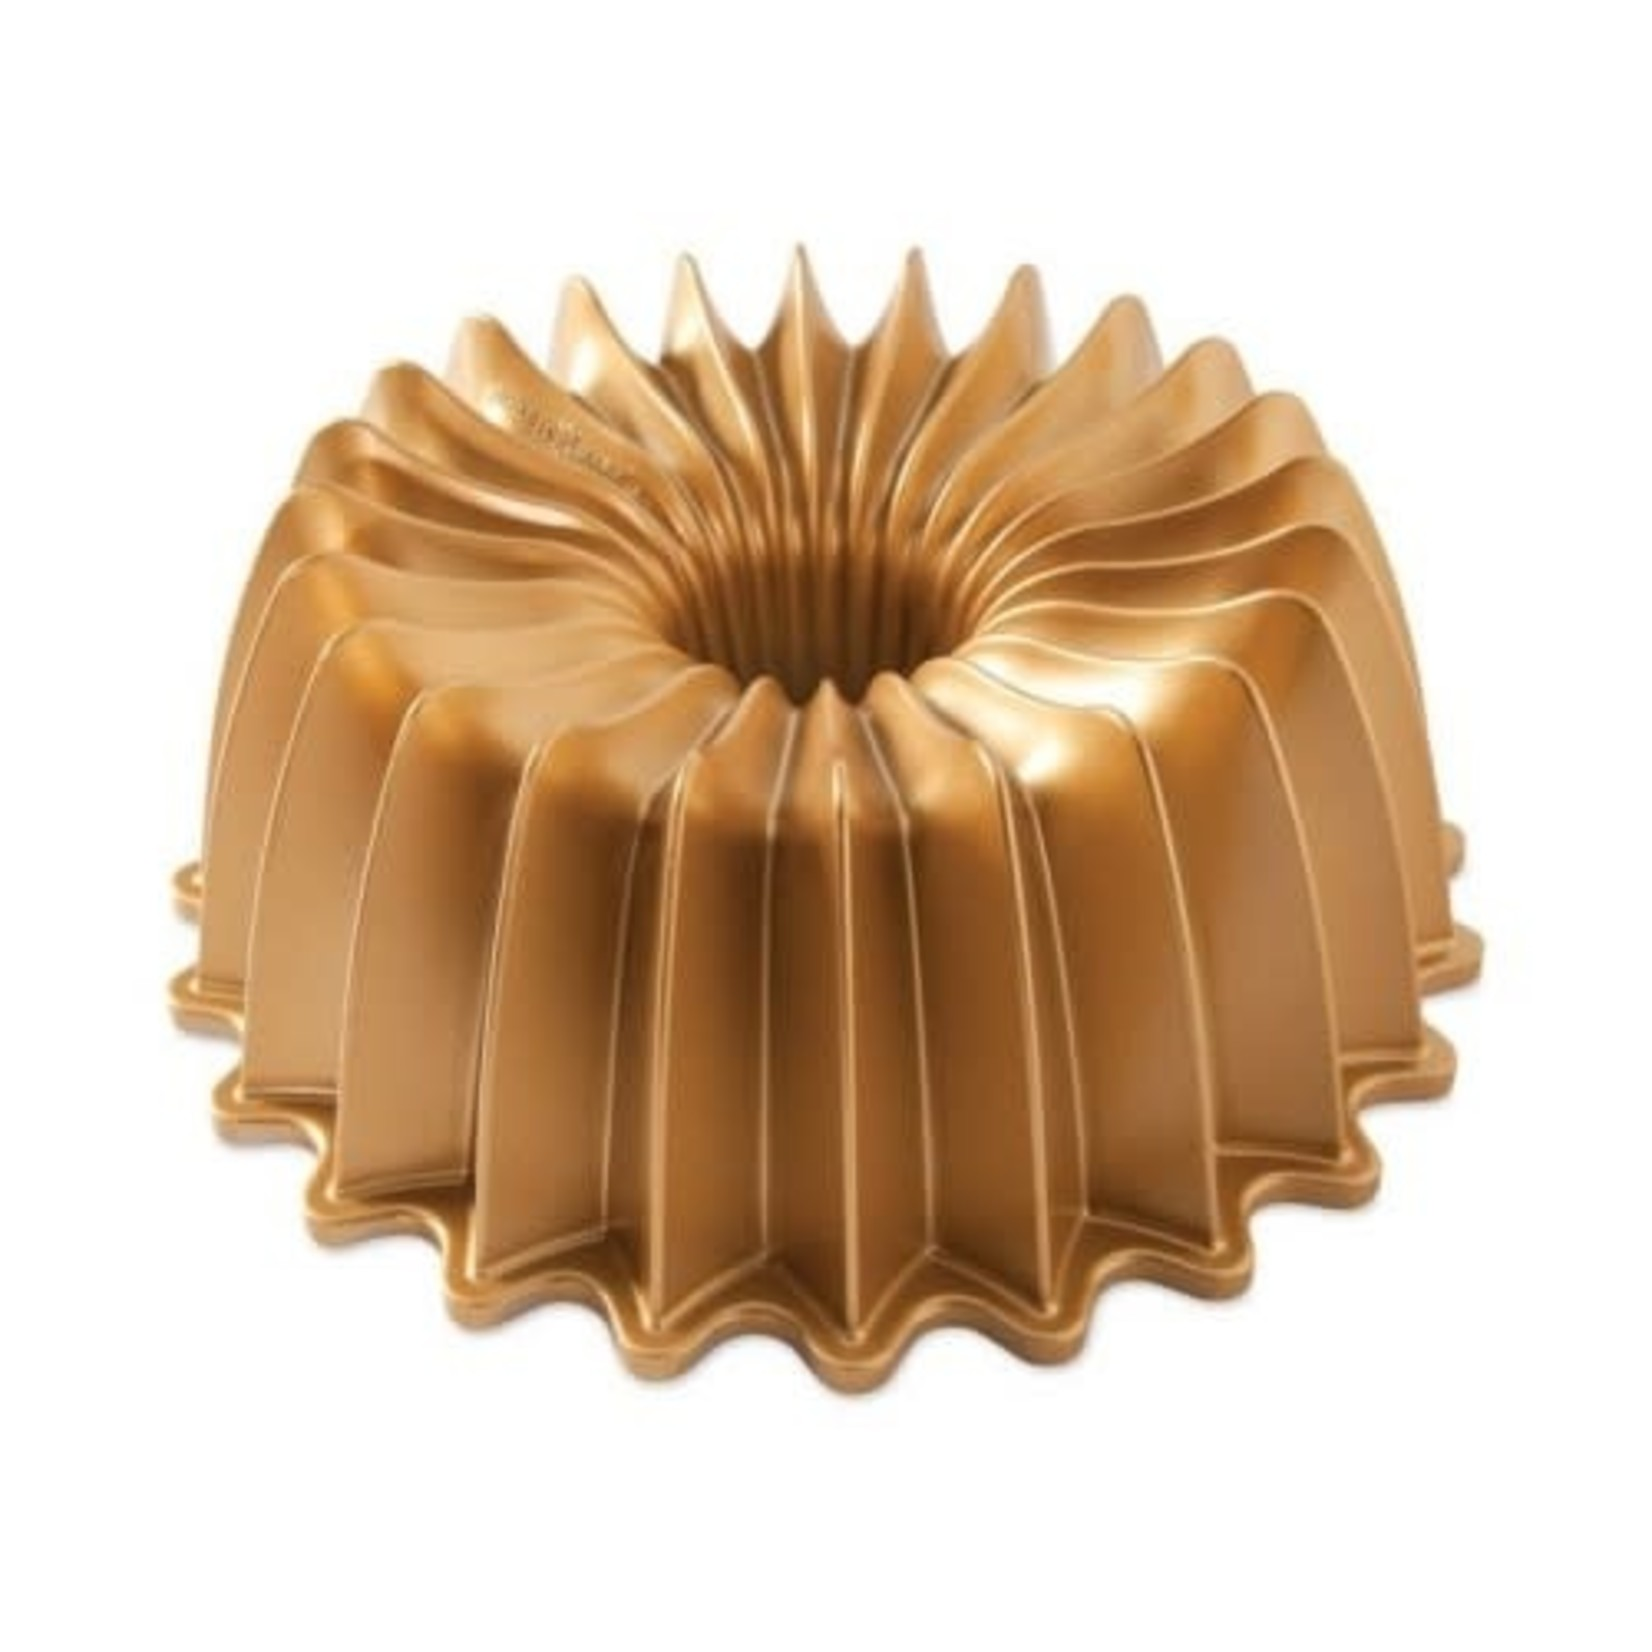 Nordic Ware Brilliance Bundt